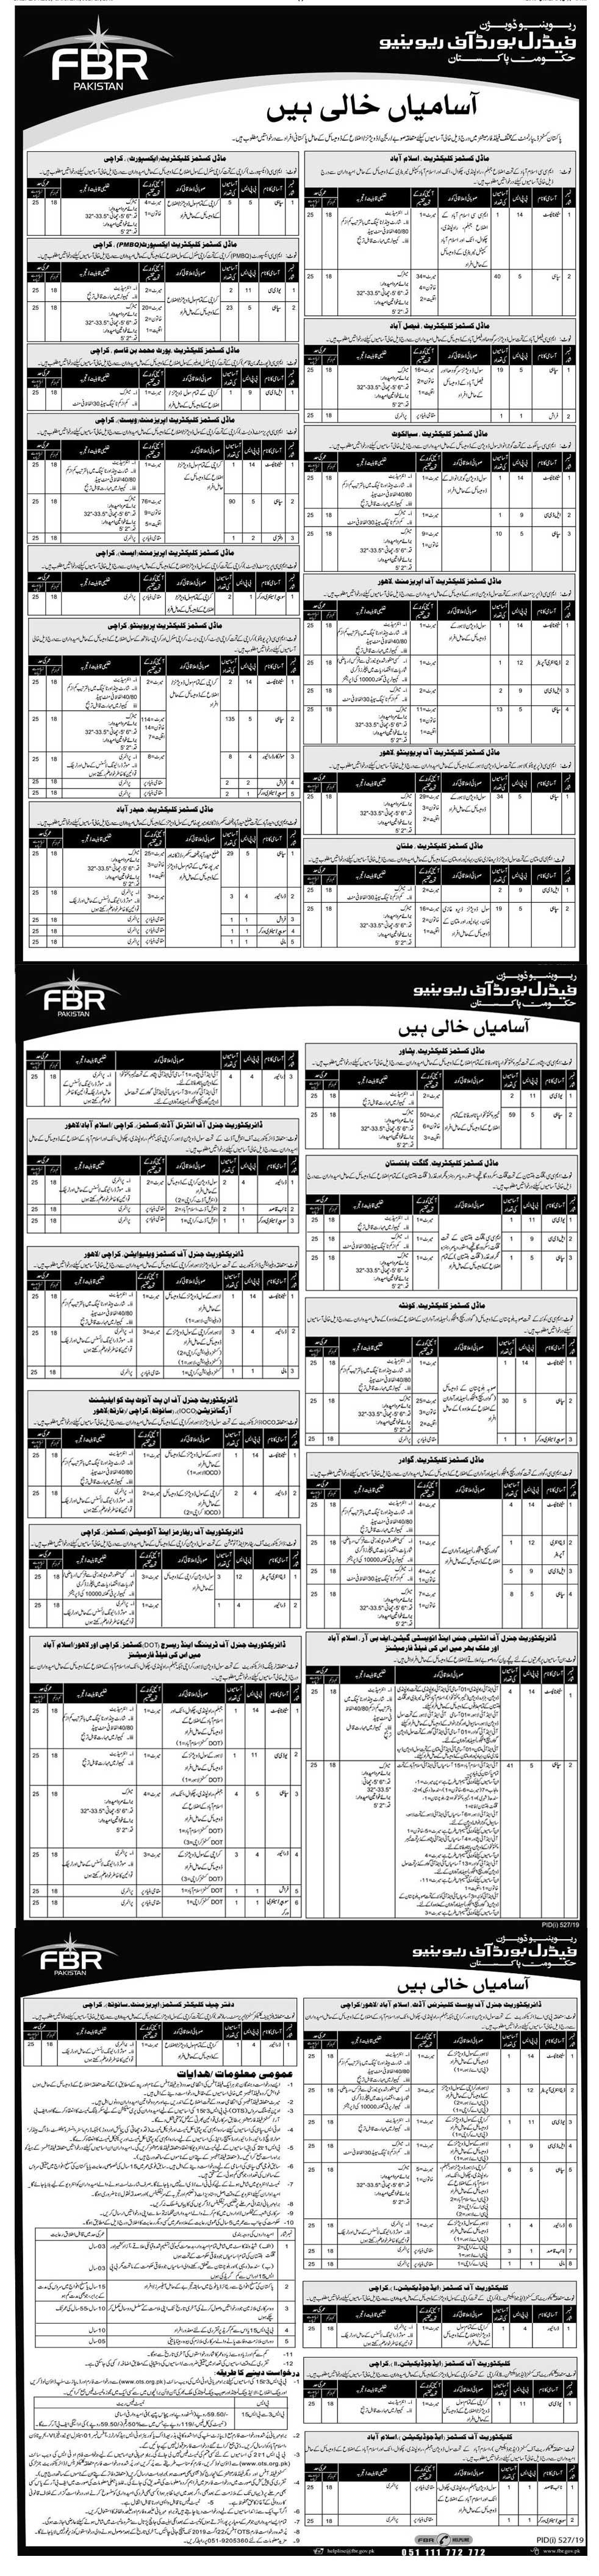 FBR Jobs In Pakistan 2019 Federal Board Of Revenue Application Form